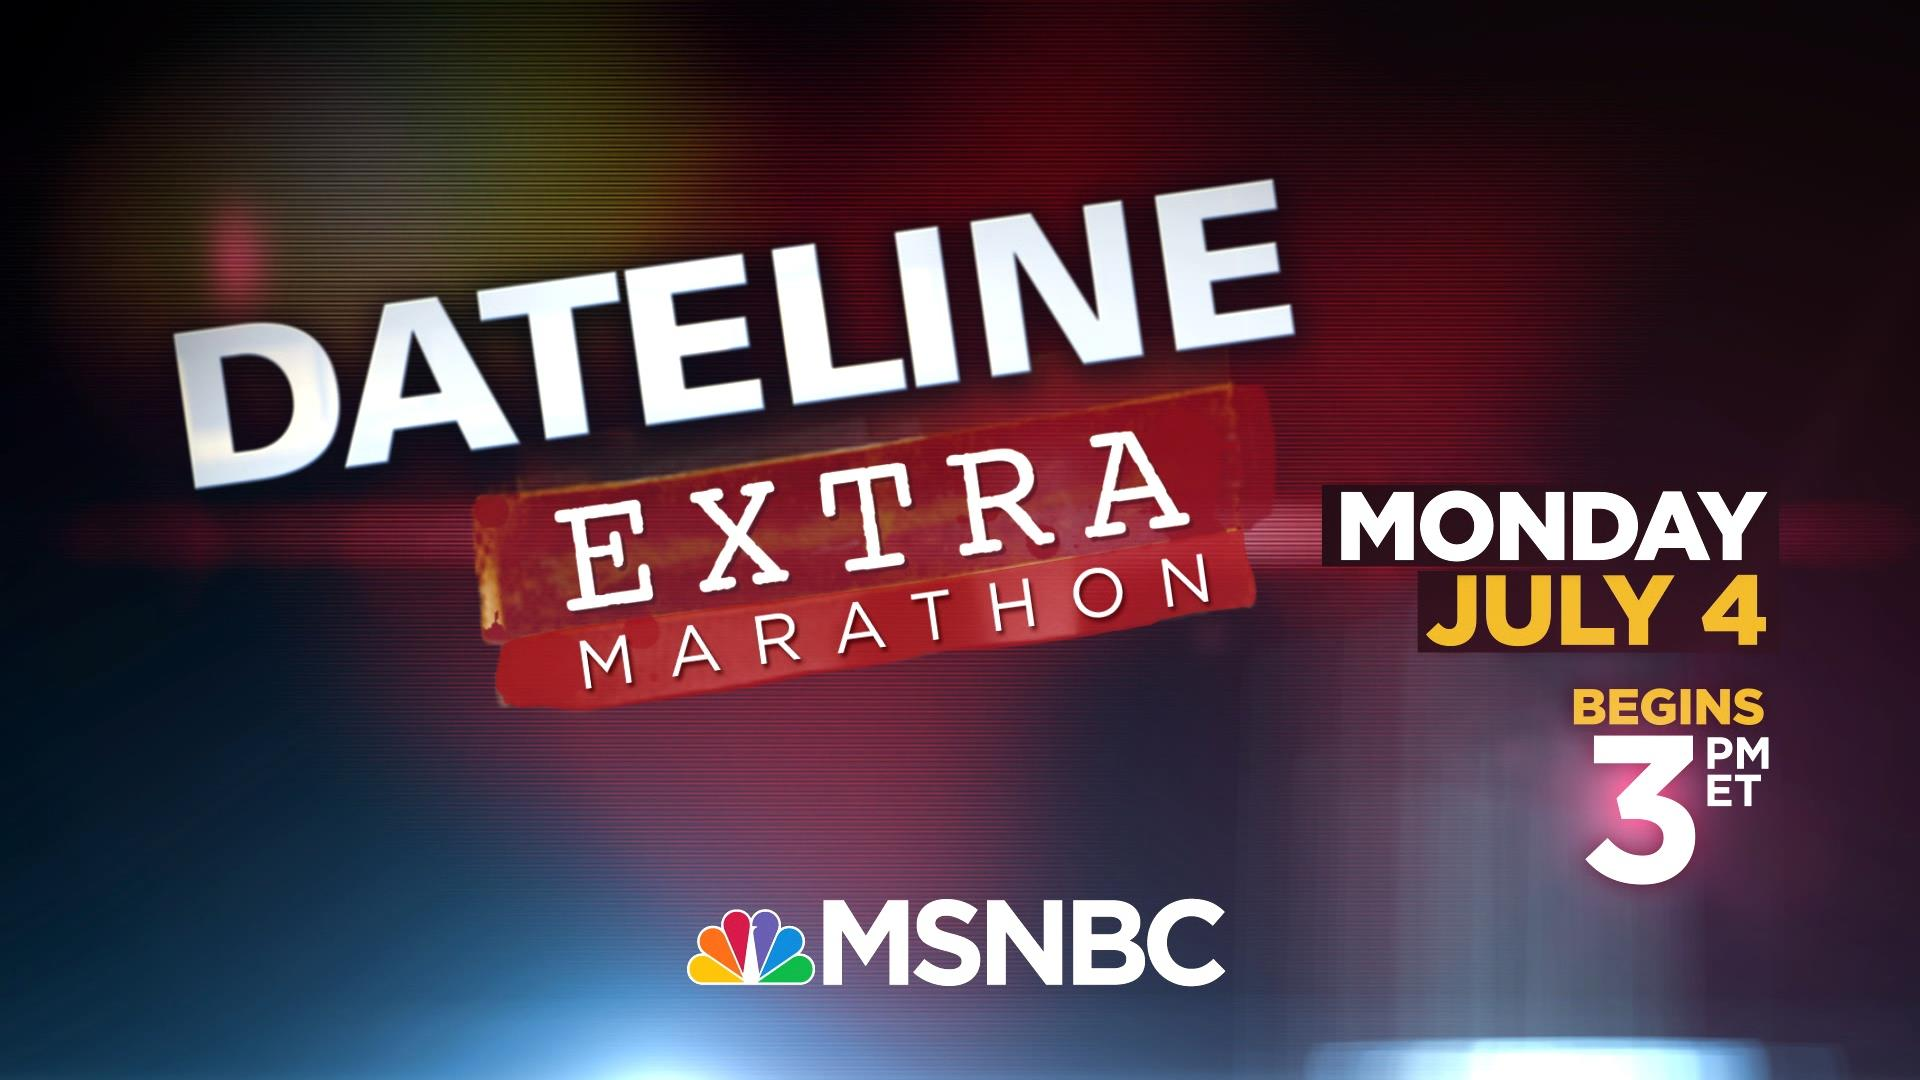 Monday, July 4: Dateline Extra on MSNBC